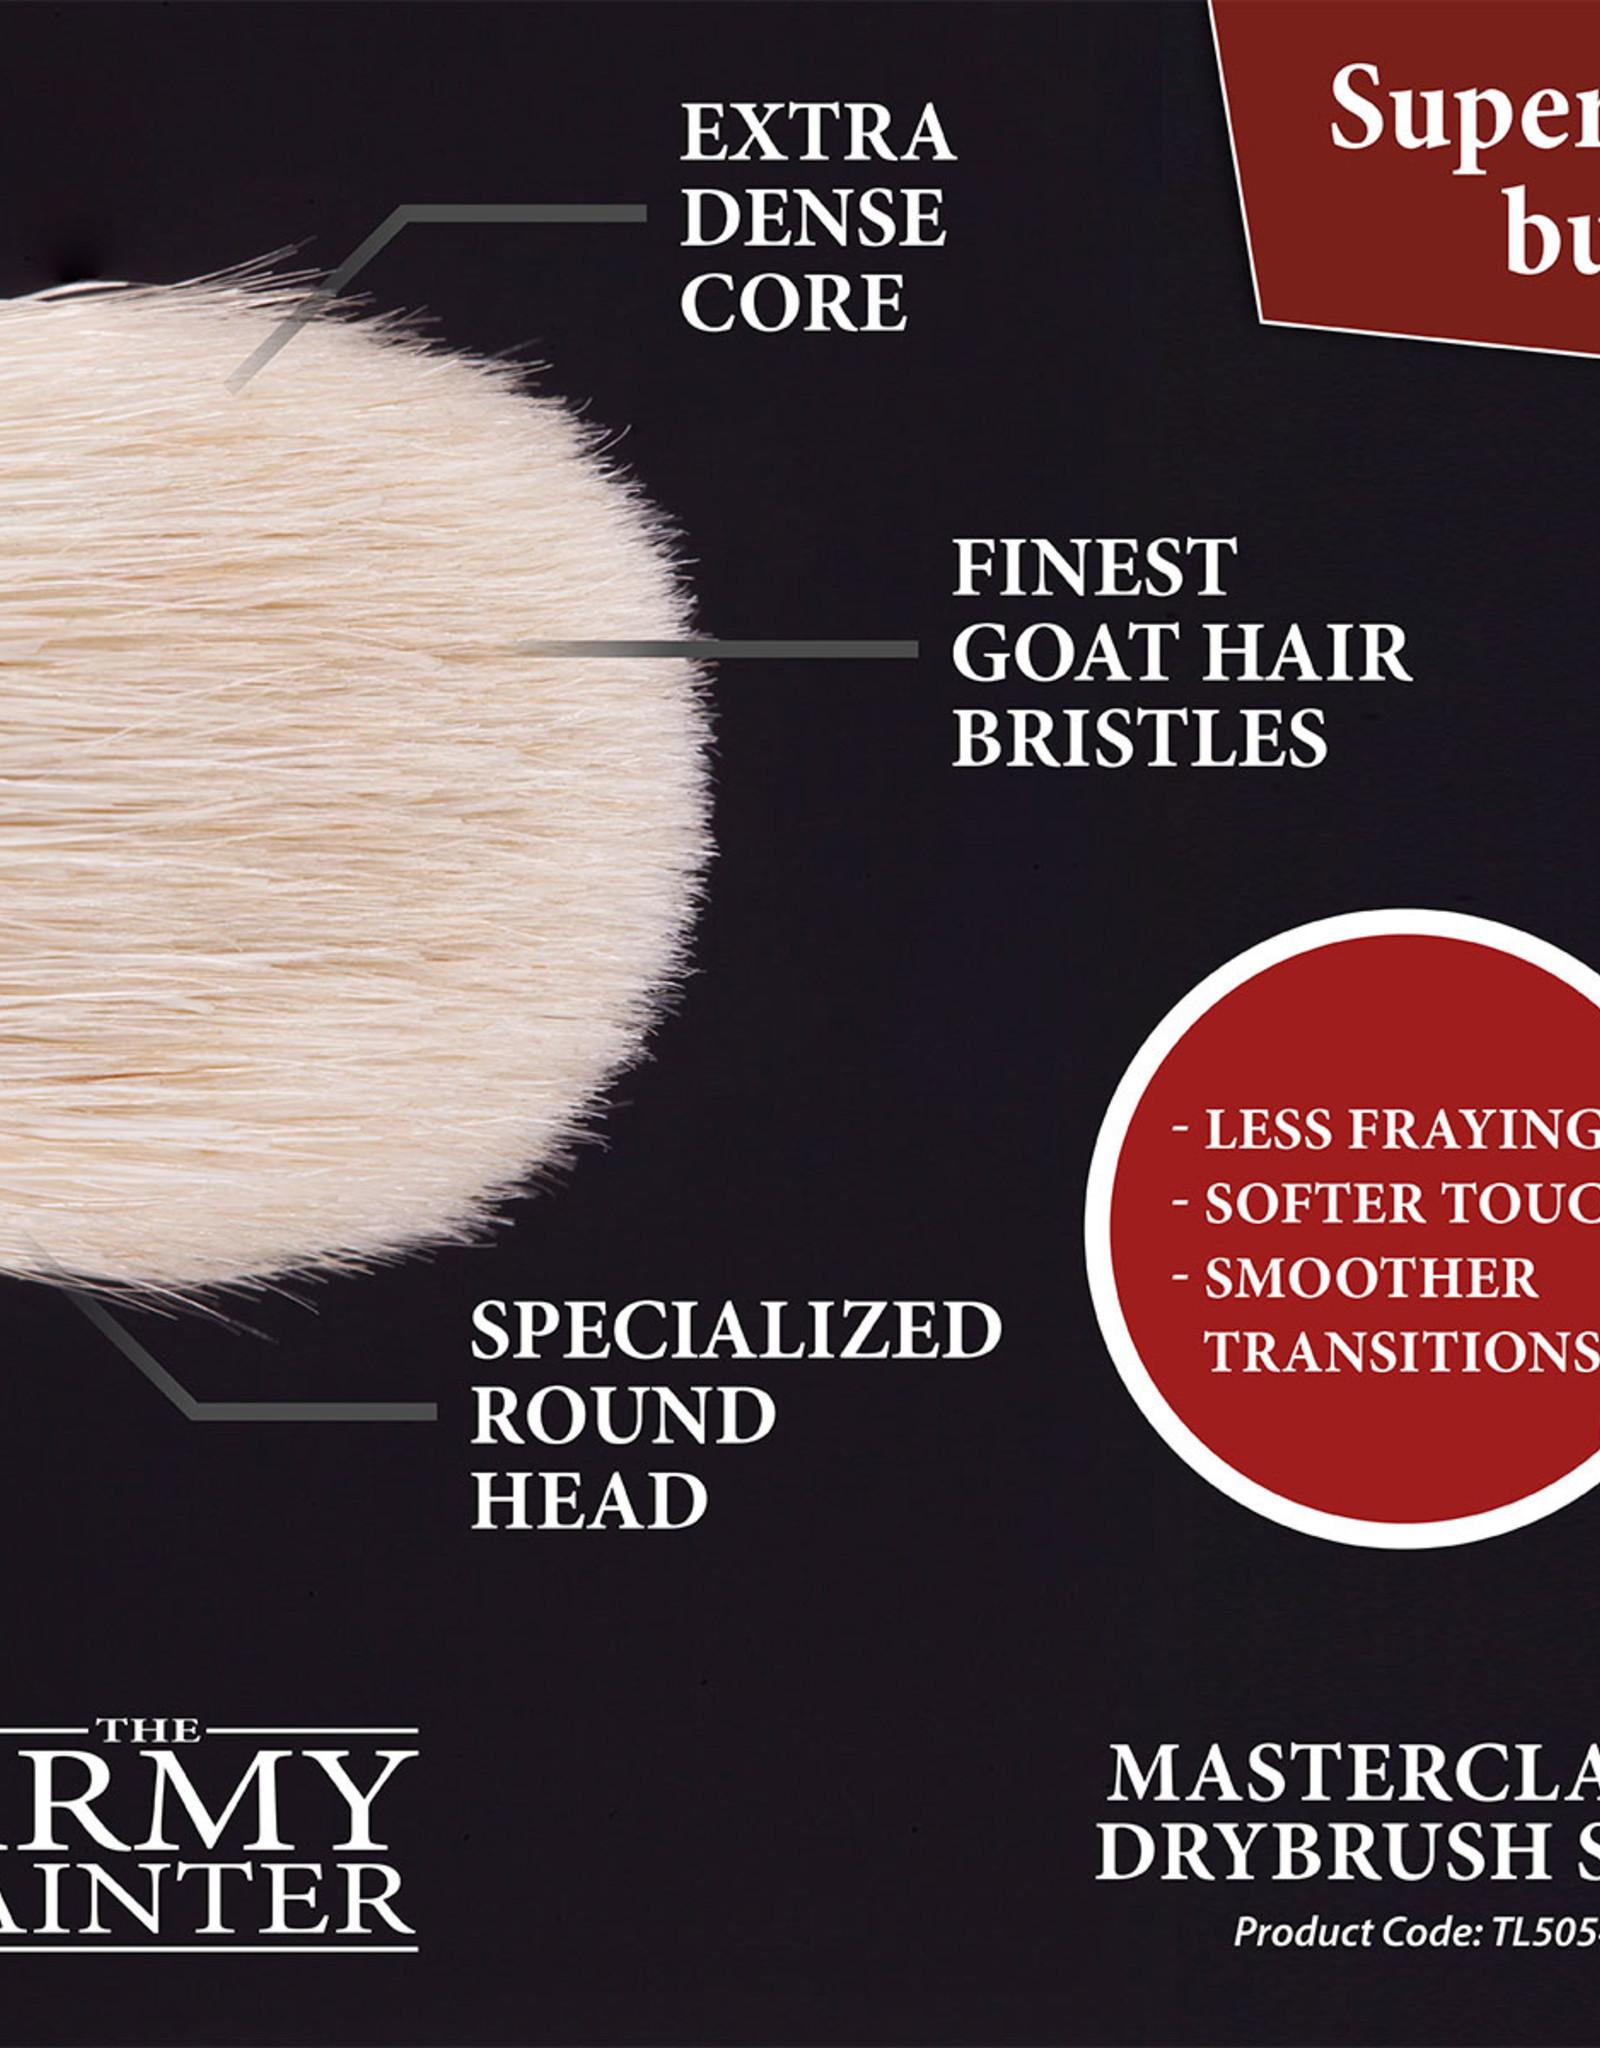 The Army Painter The Army Painter Masterclass: Drybrush Set